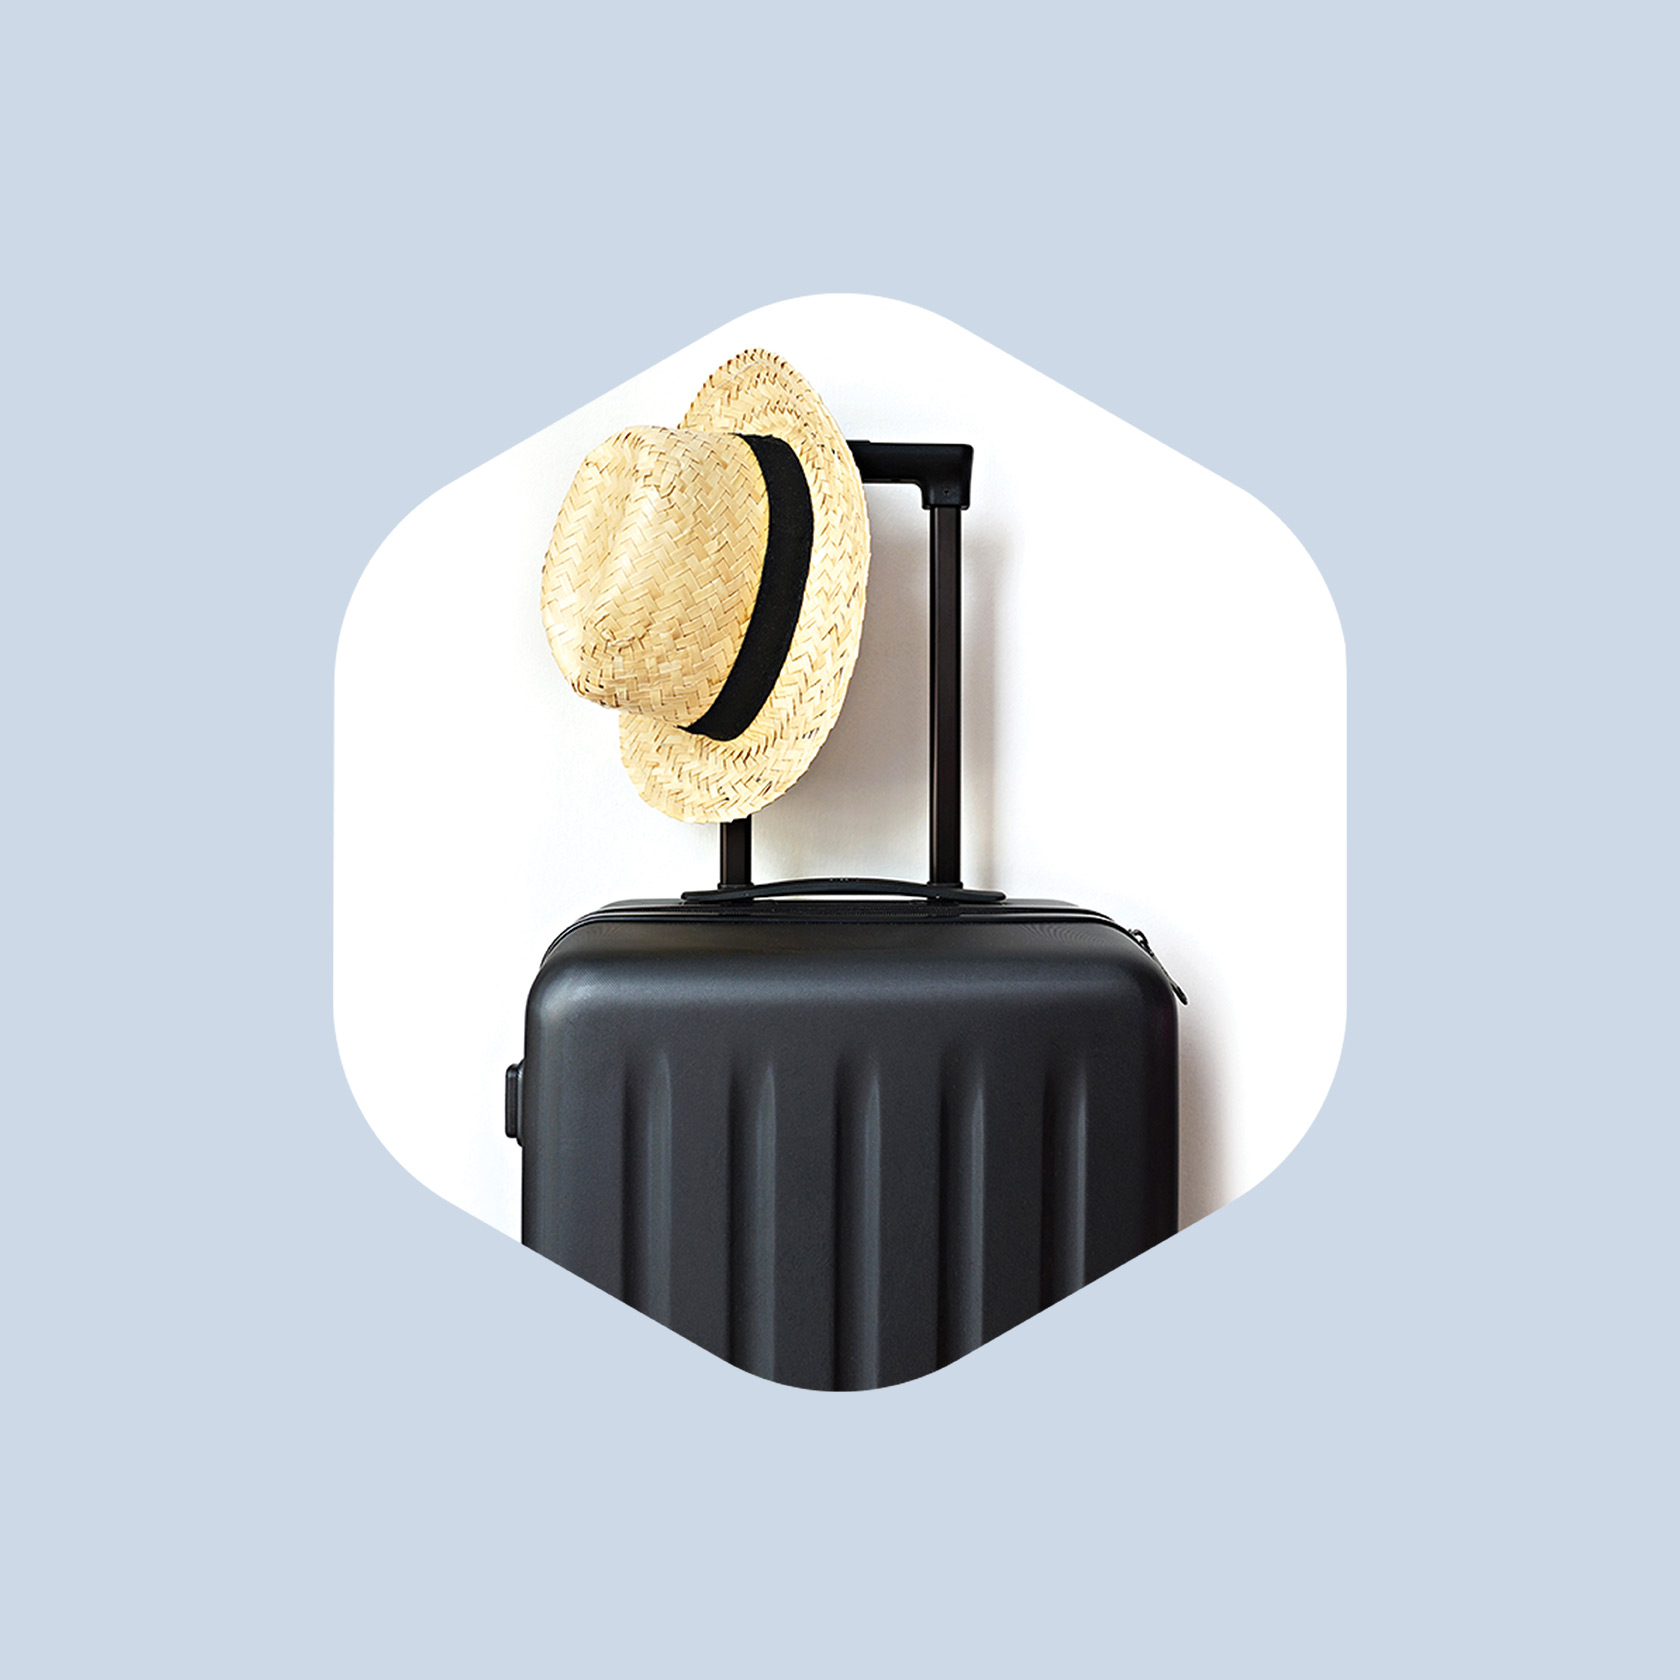 luggage event image 1